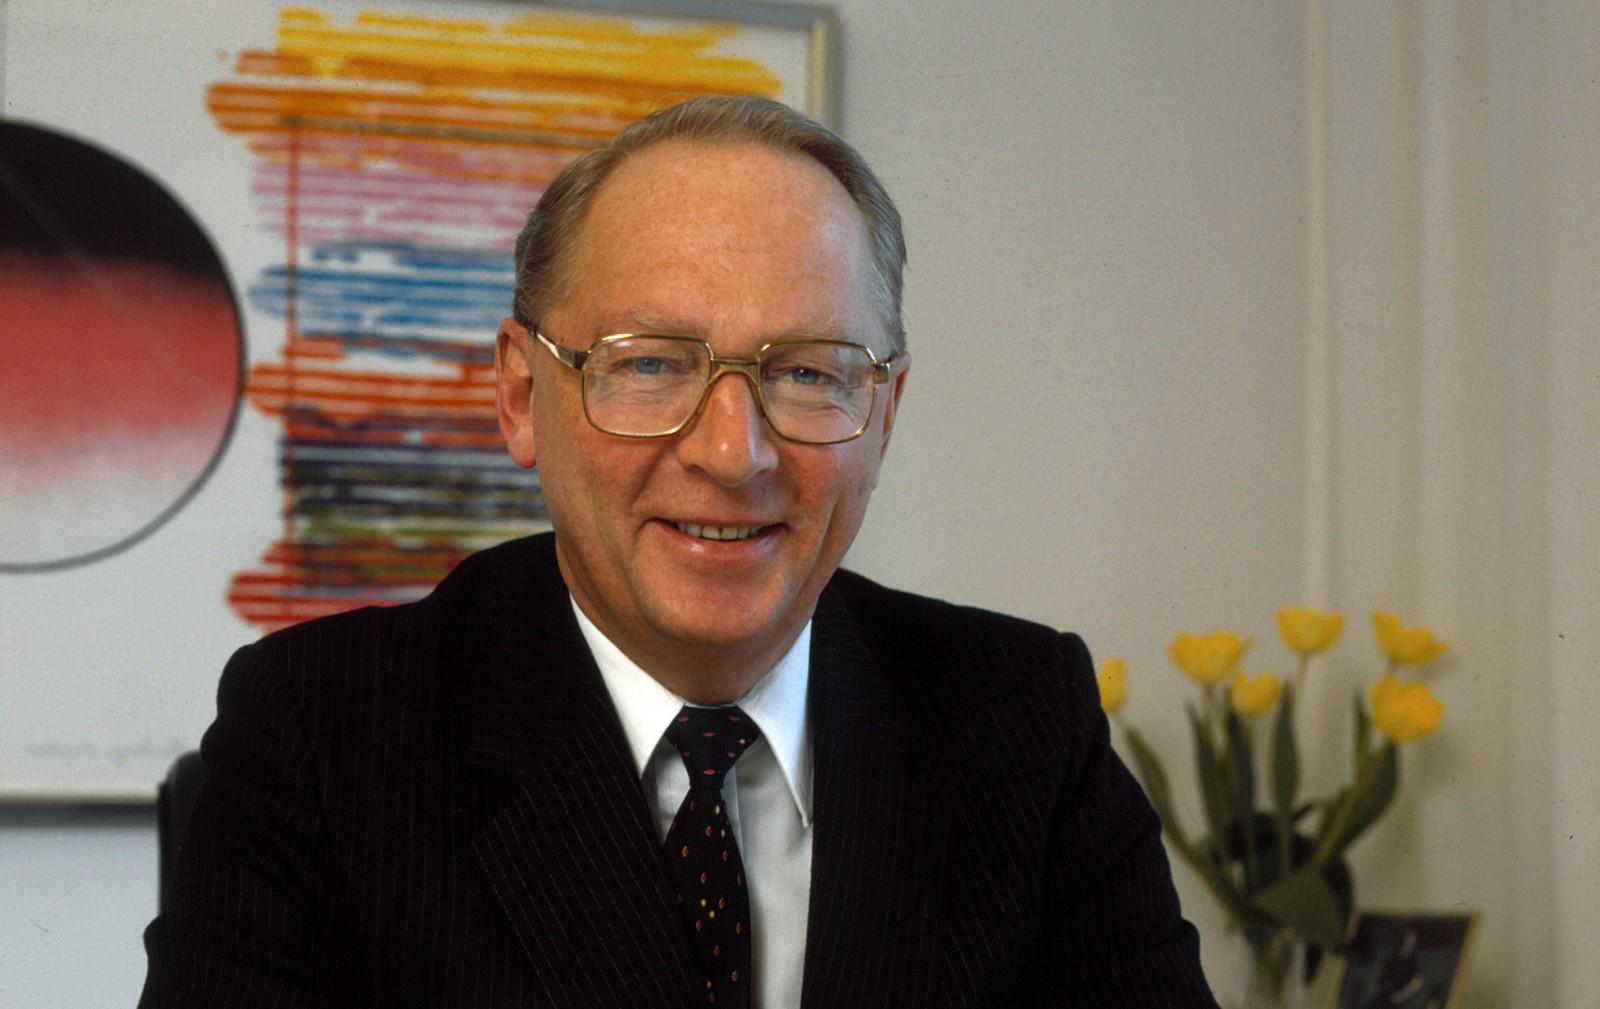 Håkan Frisinger in memoriam